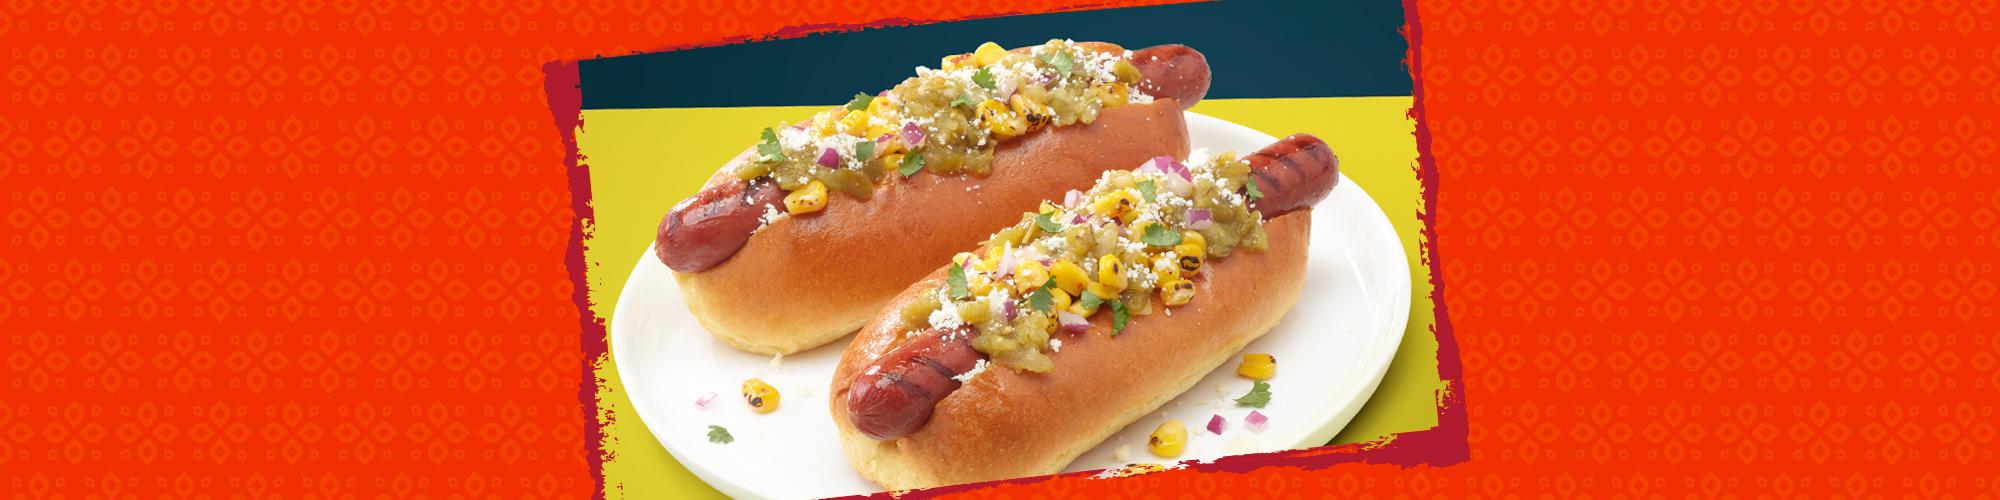 Salsas street corn verde hot dog